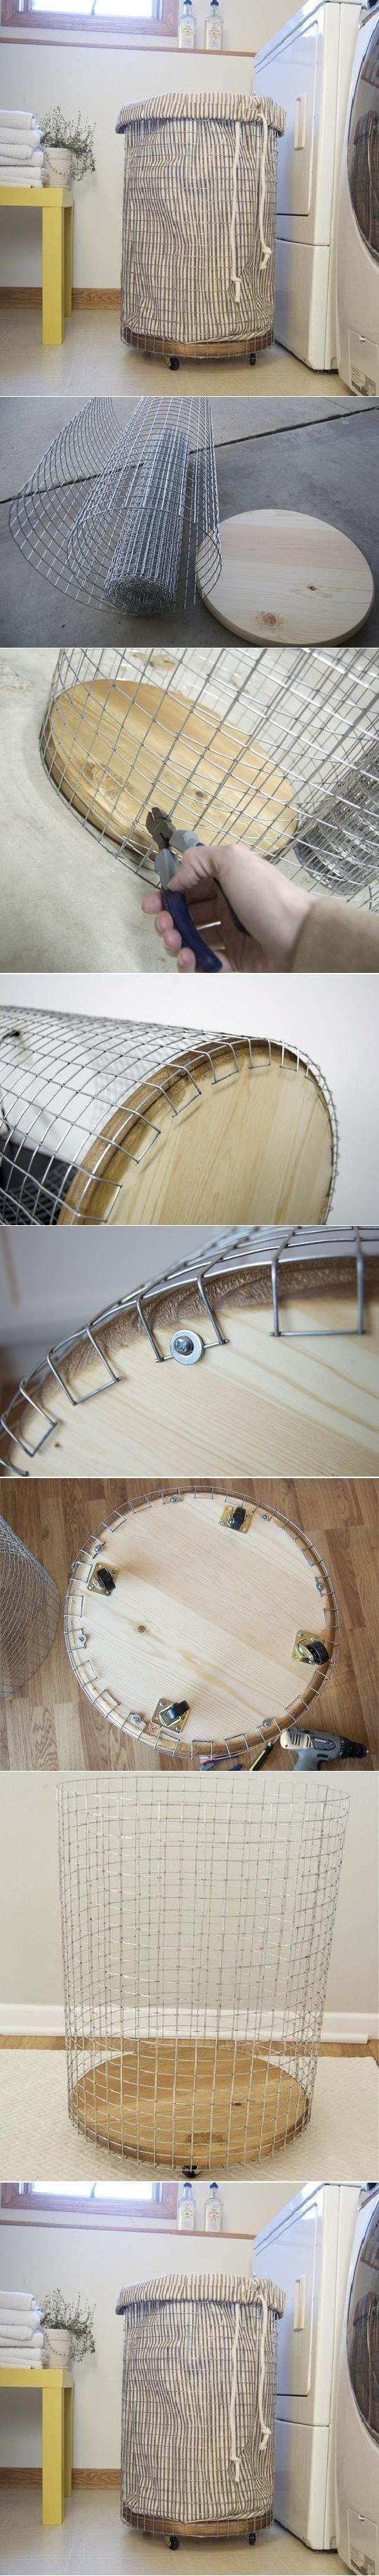 DIY Easy Laundry Basket